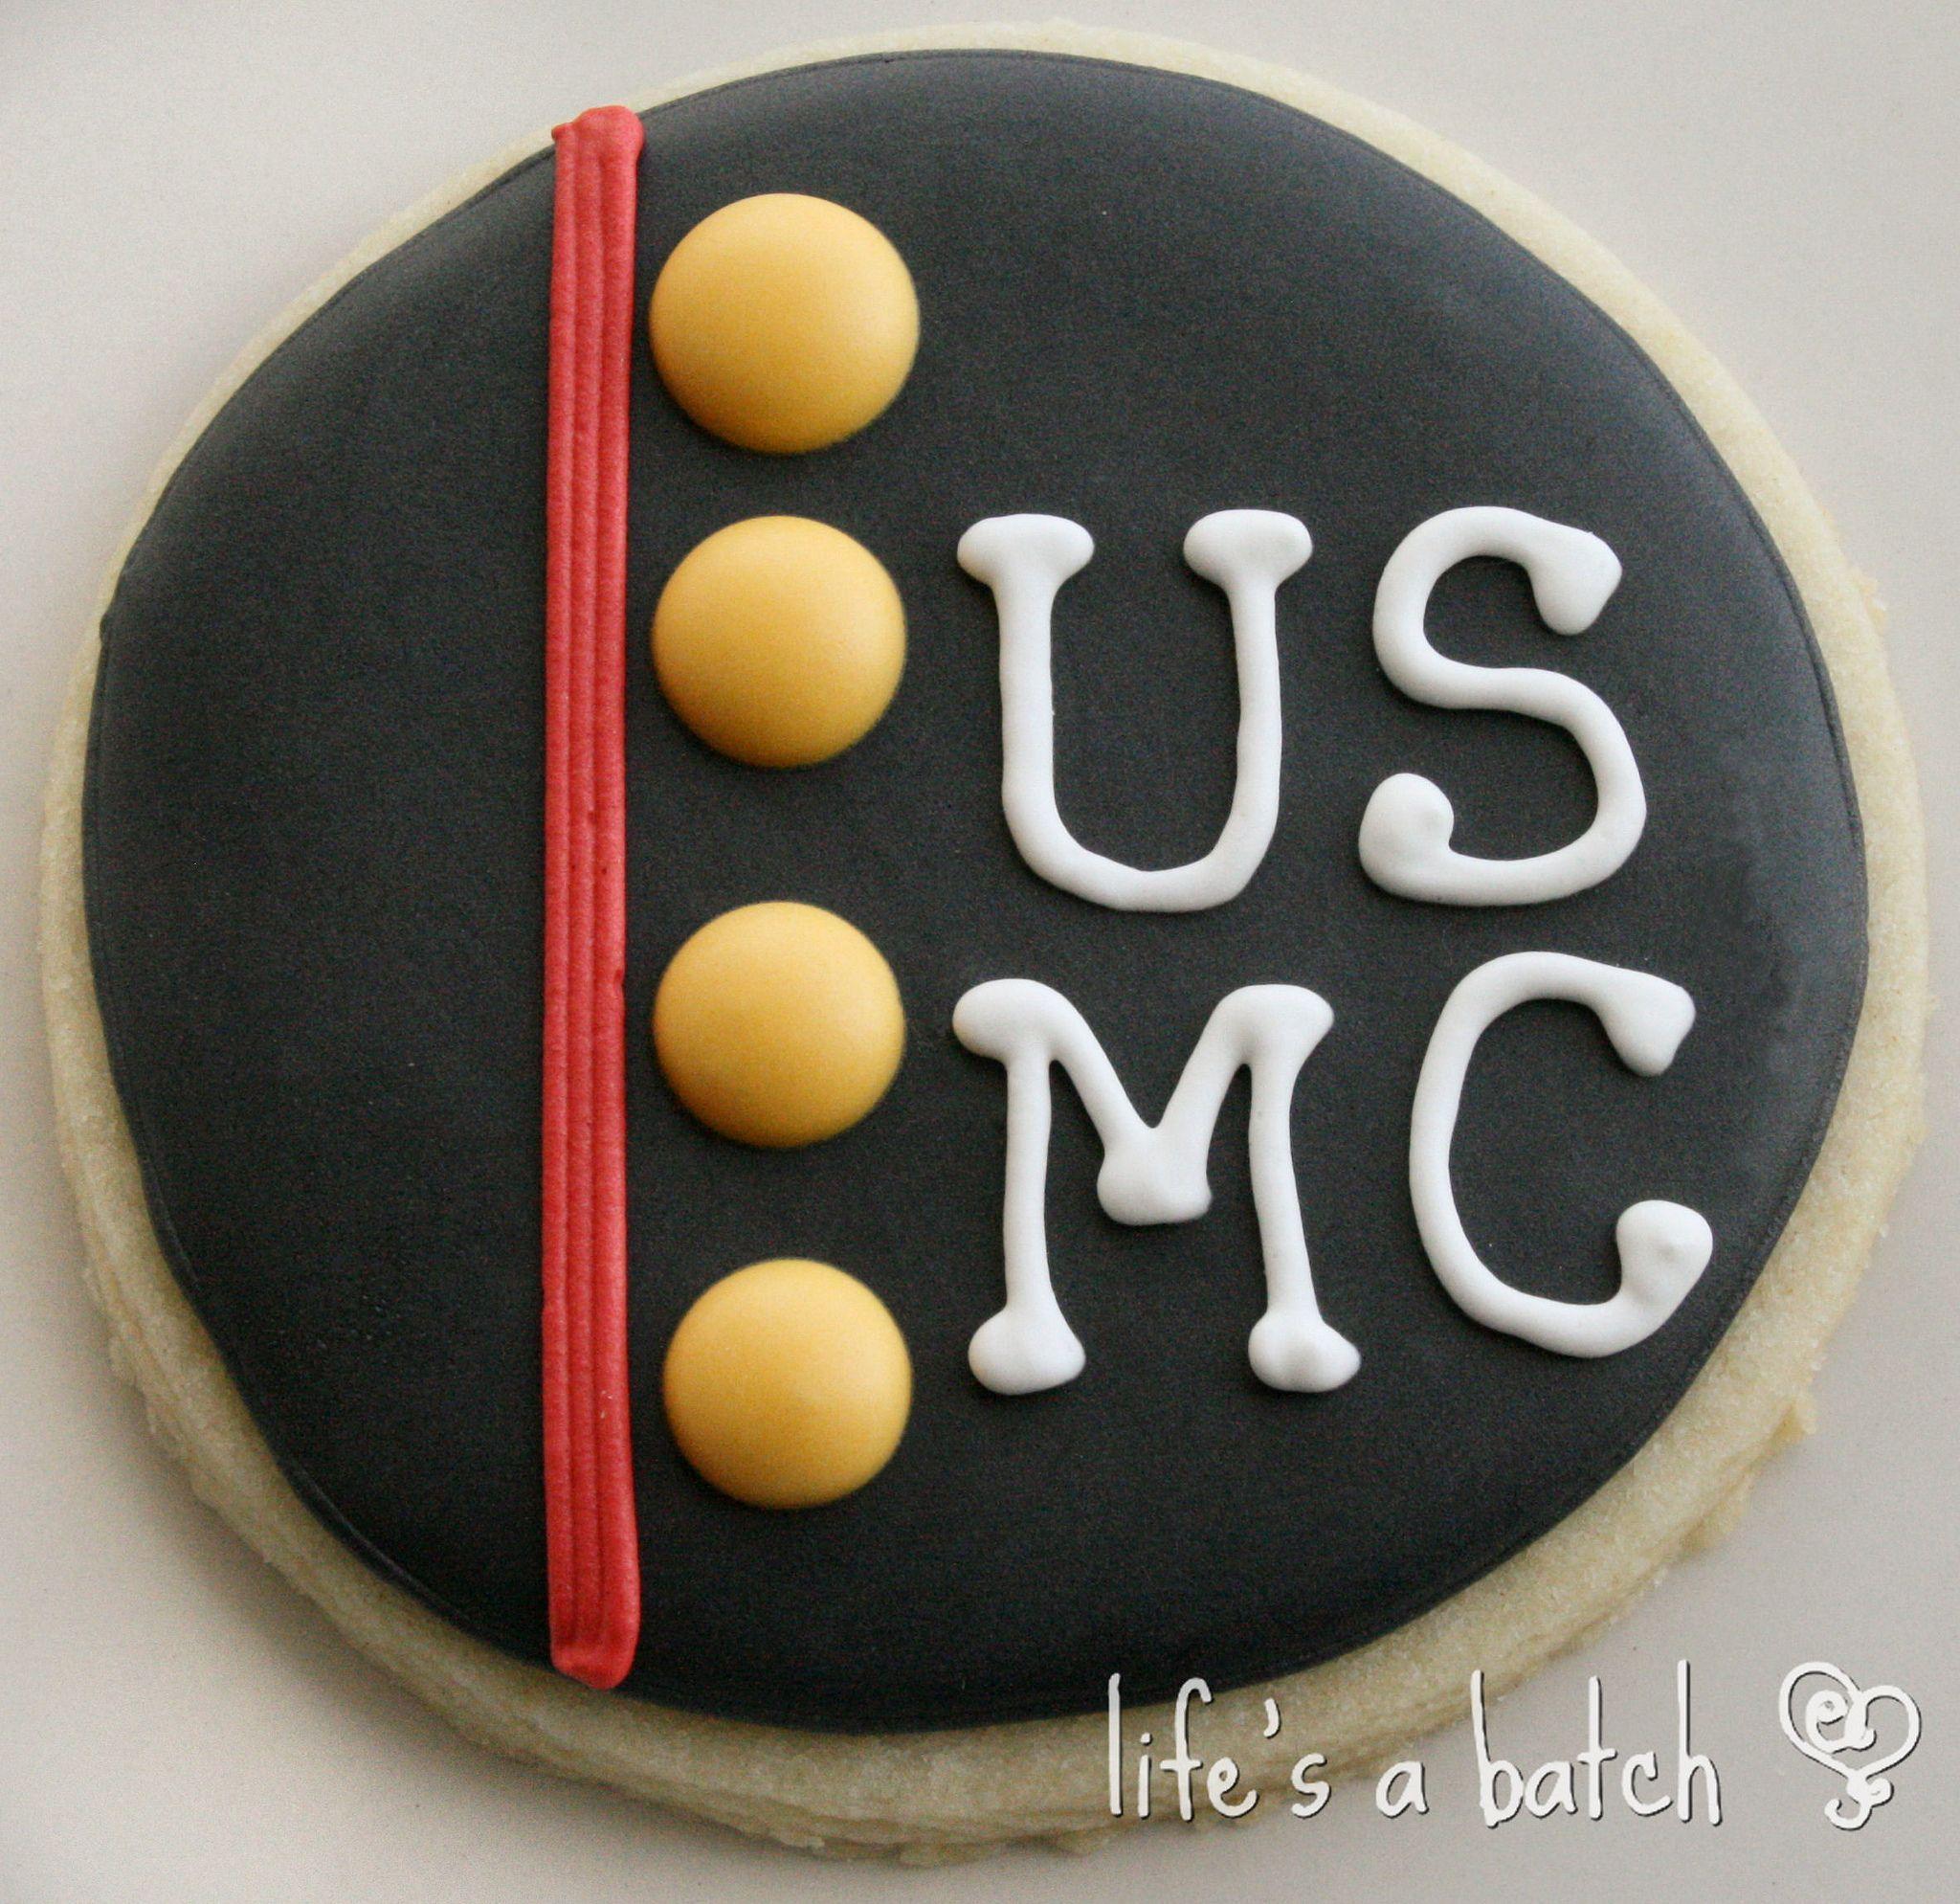 USMC cookie. in 2020 Marine cake, Cookie decorating